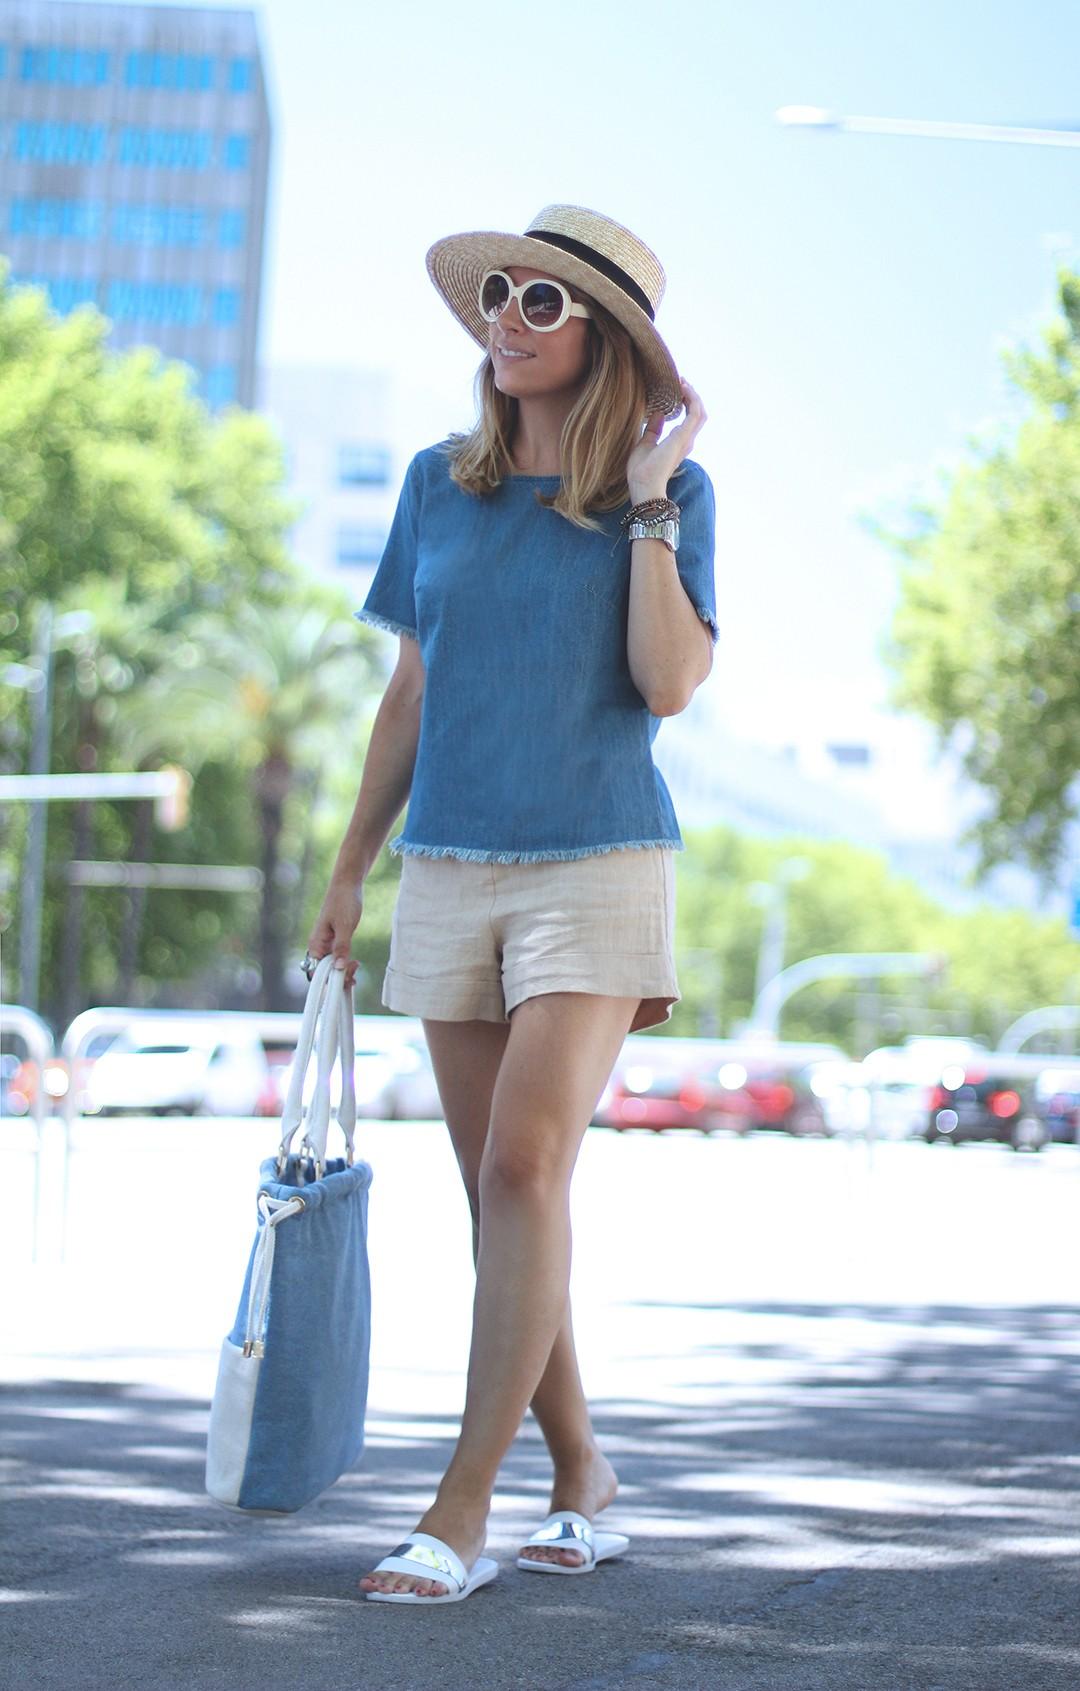 Barcelona-fashion-blog-Monica-Sors-denim-outfit-22JPG